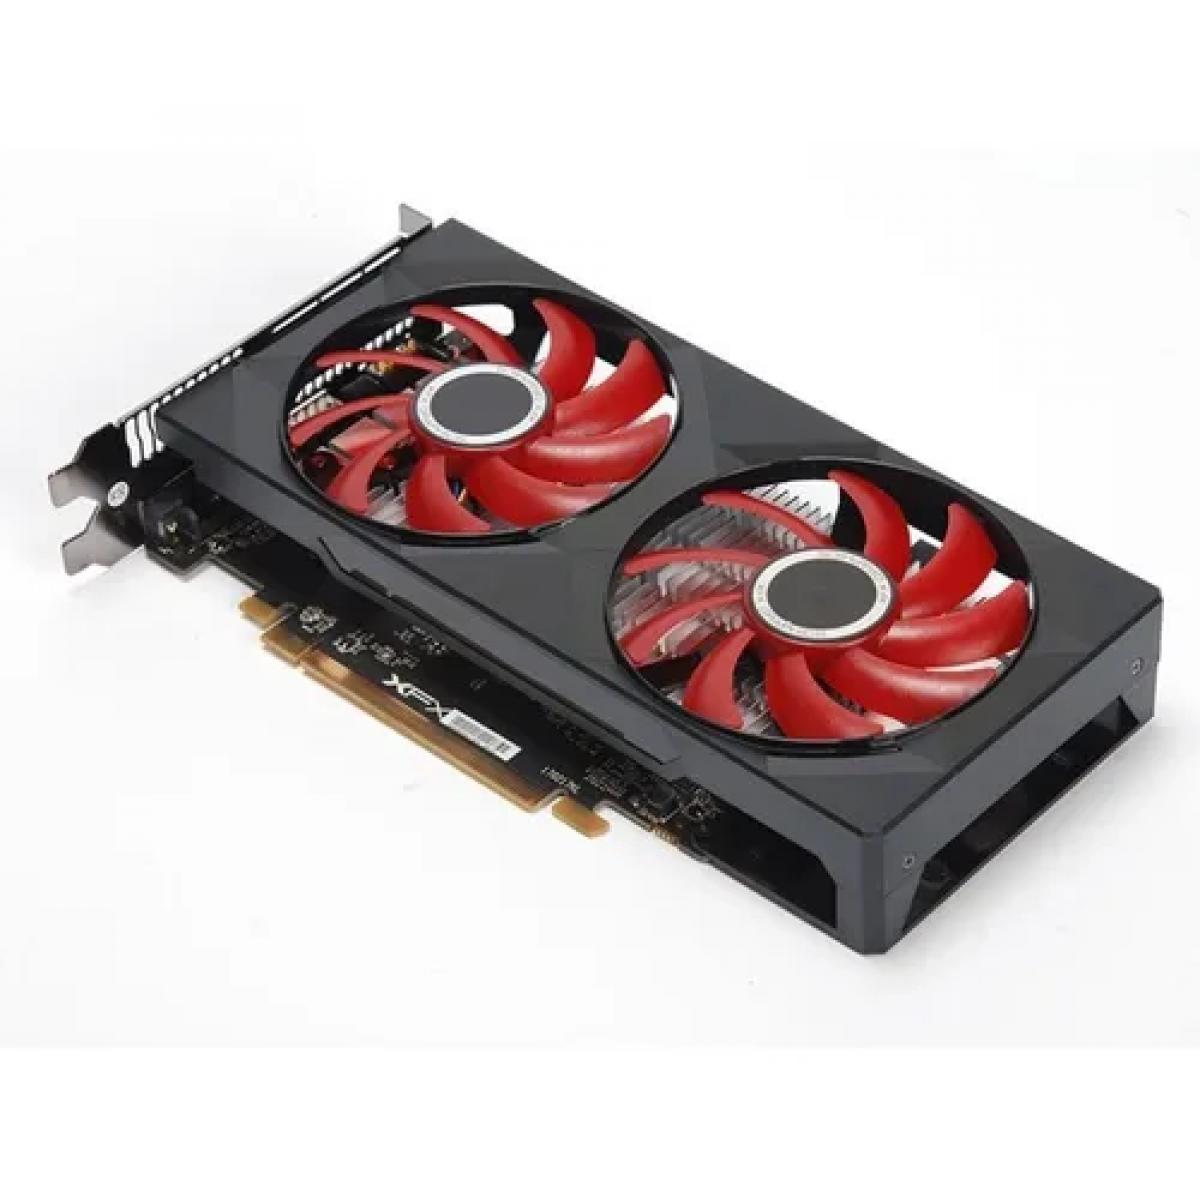 Placa de Vídeo XFX AMD Radeon RX 550, 4GB, GDDR5, 128bit, 550P4PFG5 - Open Box